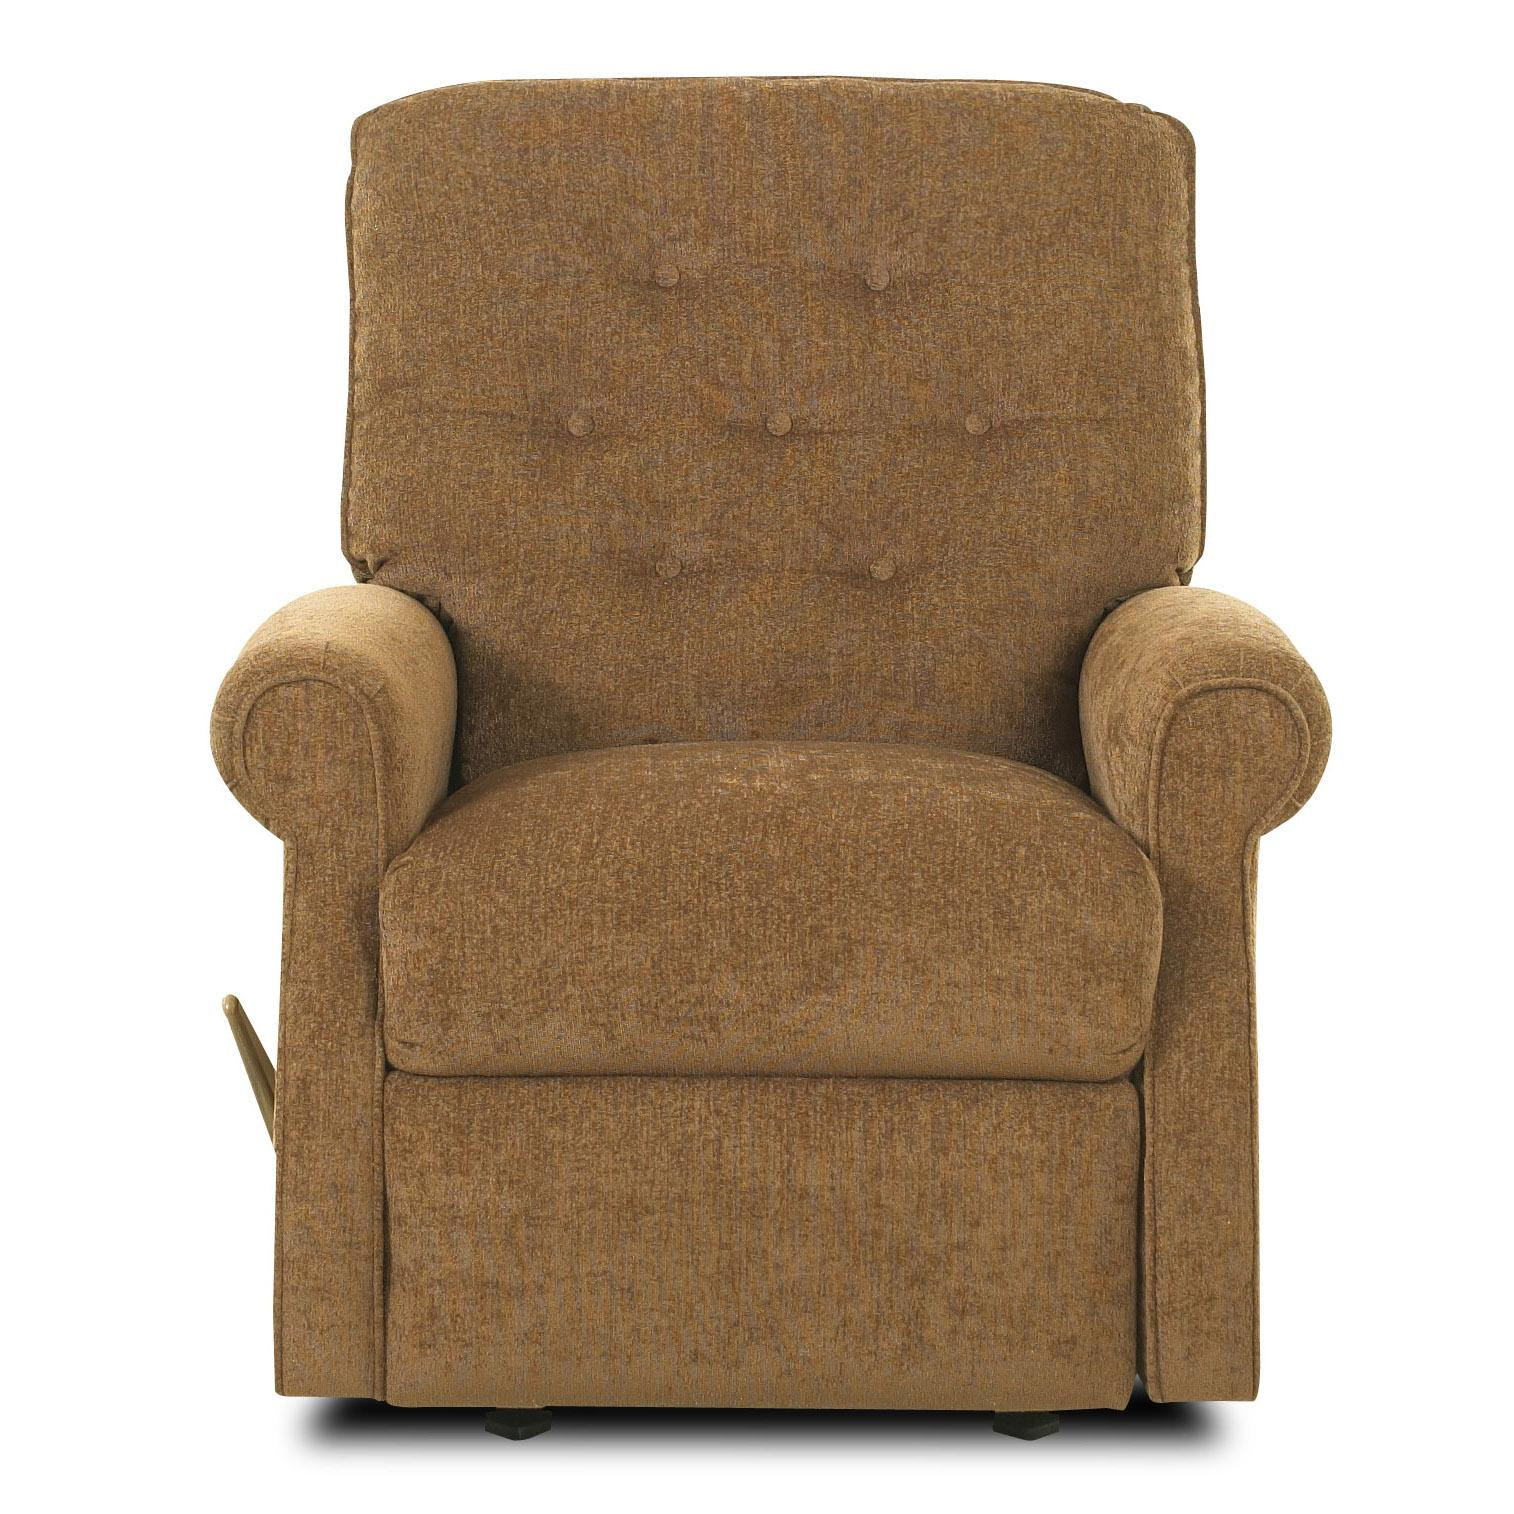 Virgo Reclining Rocking Chair